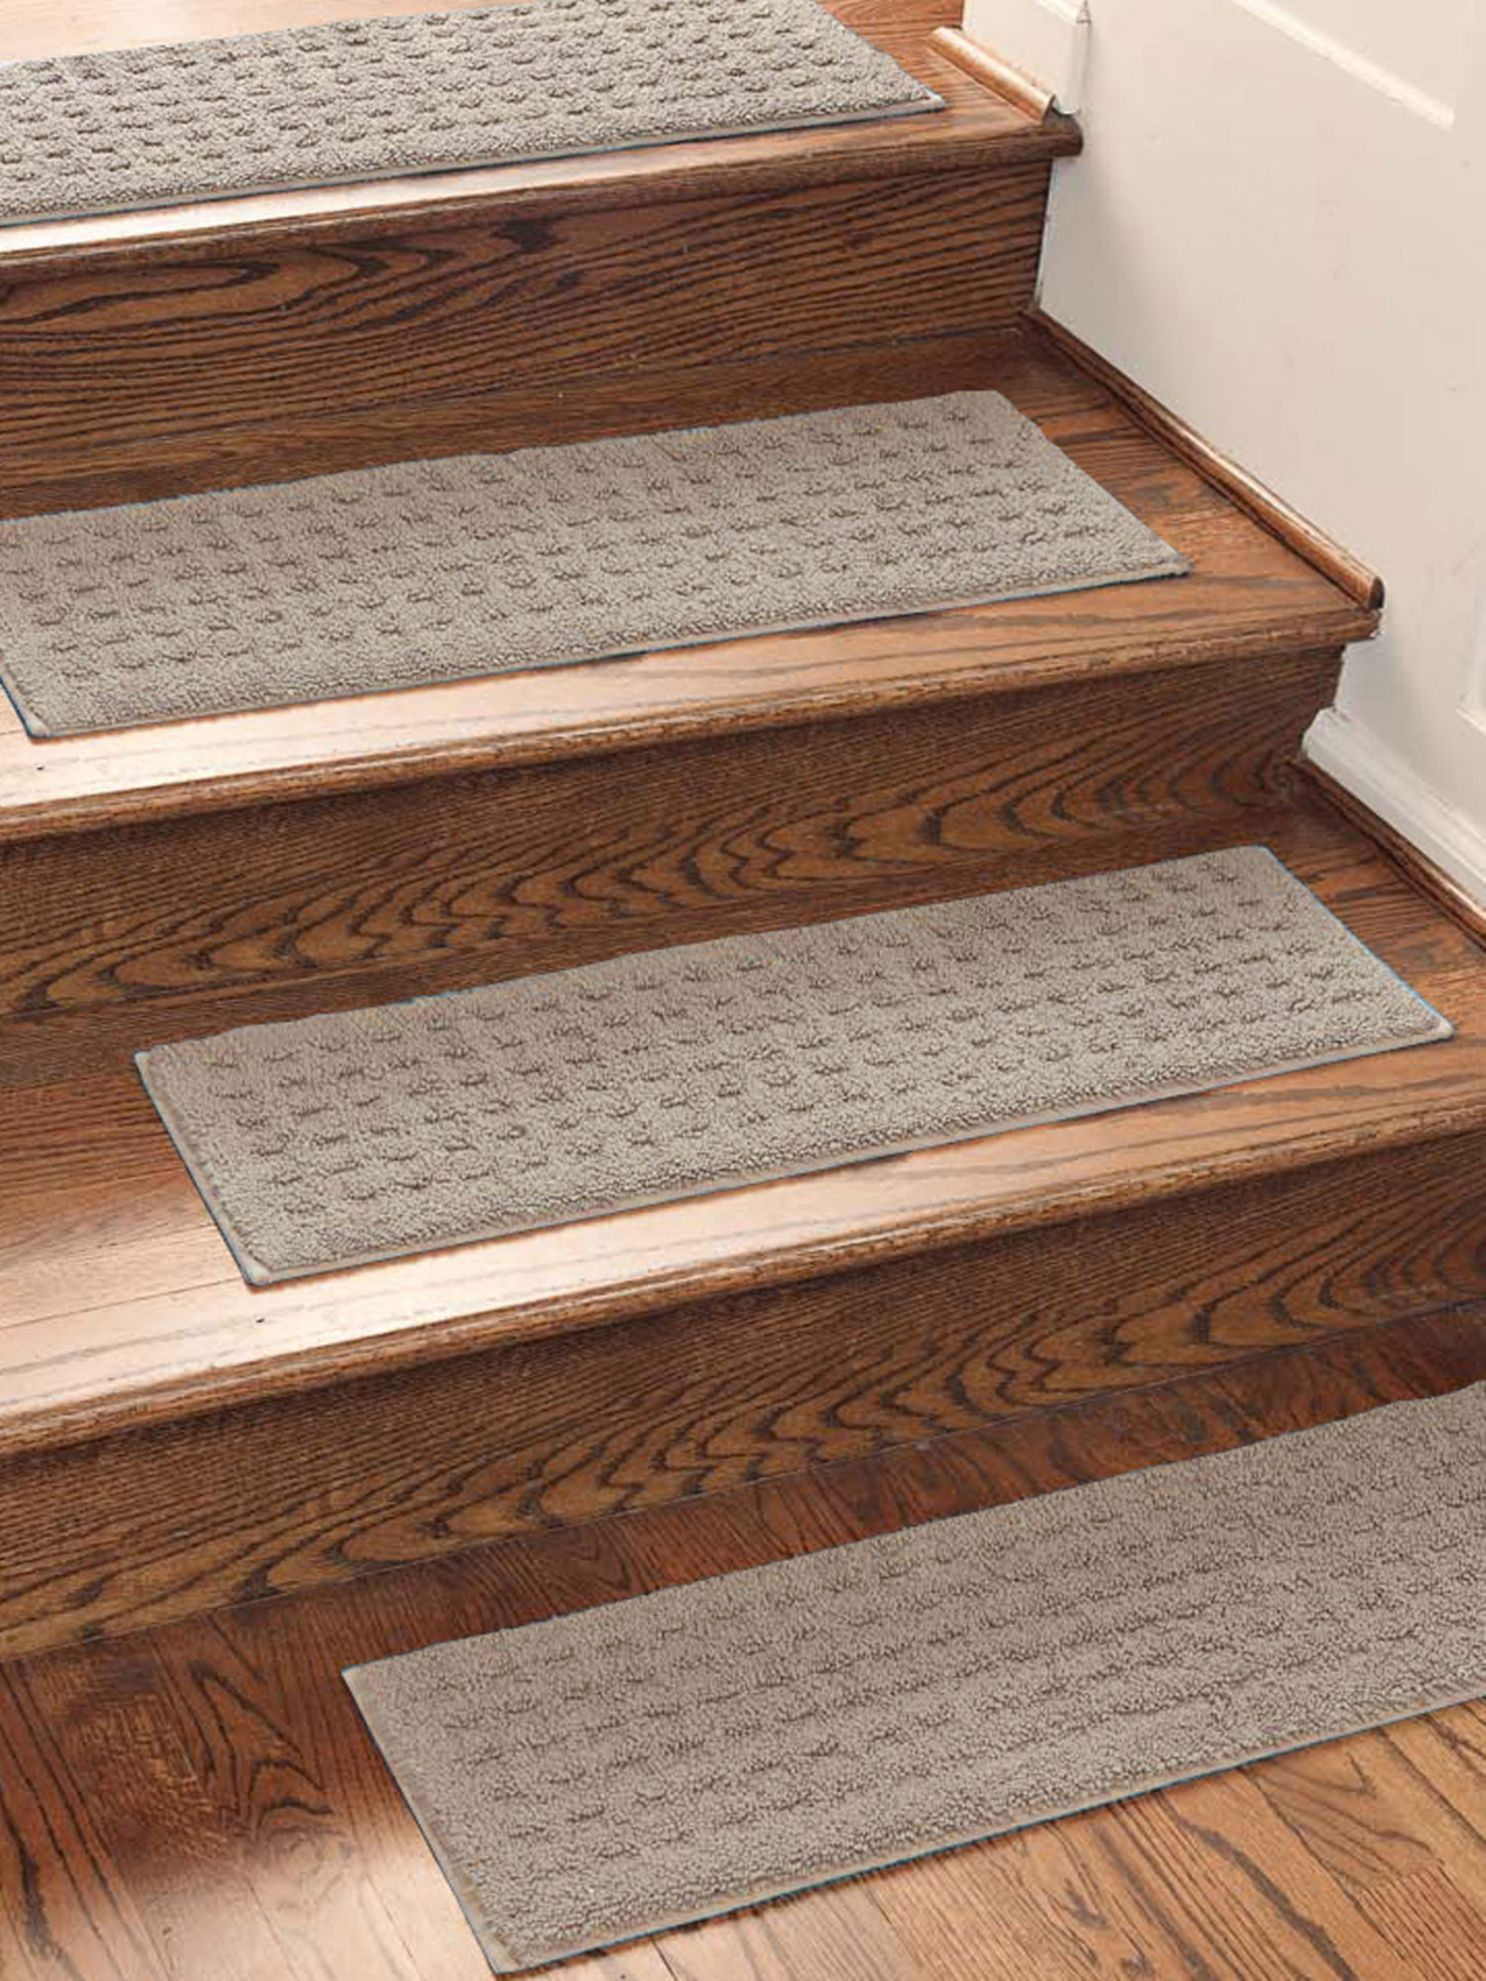 Vista Rug Nonslip Indoor Rug Stair Treads Solutions Wood   Indoor Carpet Stair Treads   Oak Valley   Rug Indoor   Indoor Outdoor   Mat   Stair Runner